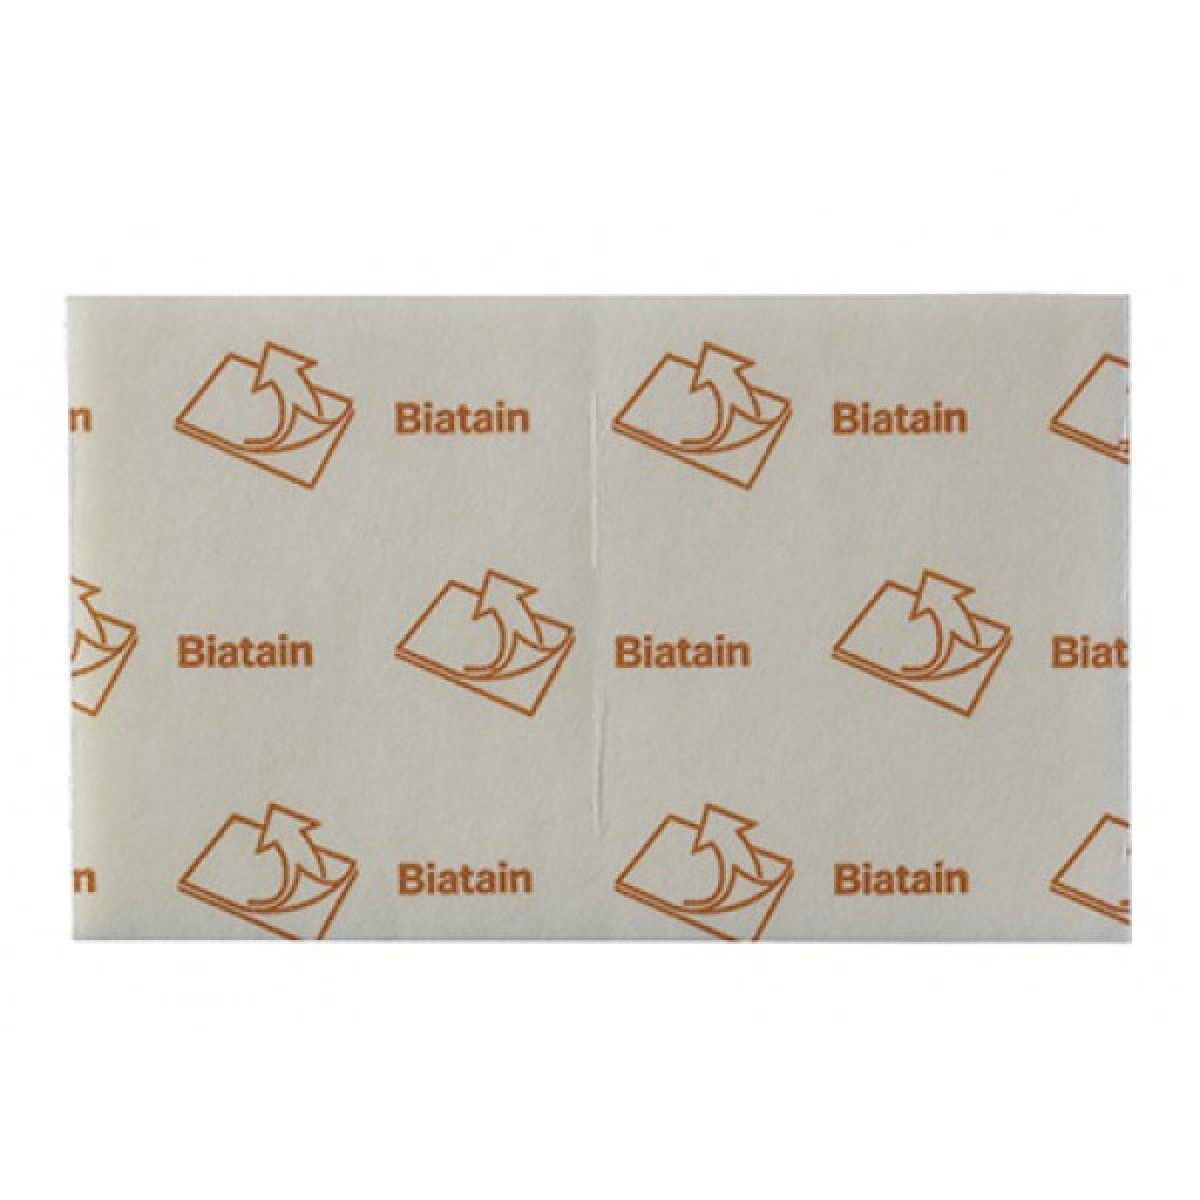 Biatain Cavidade 5 X 8 33451 - (Coloplast)